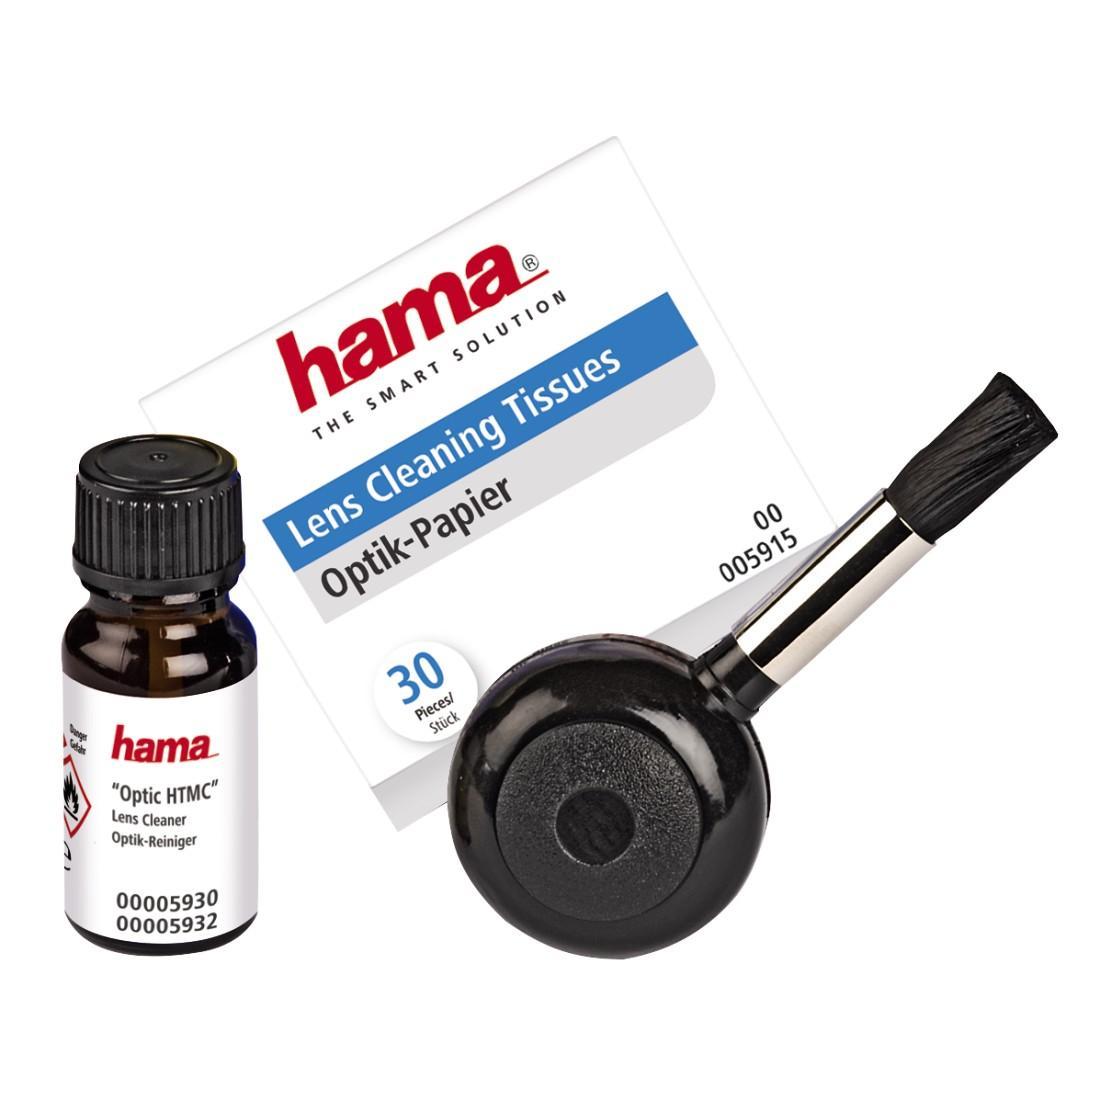 Комплект за почистване на обективи HAMA Optik HTMC 05932, 3 части